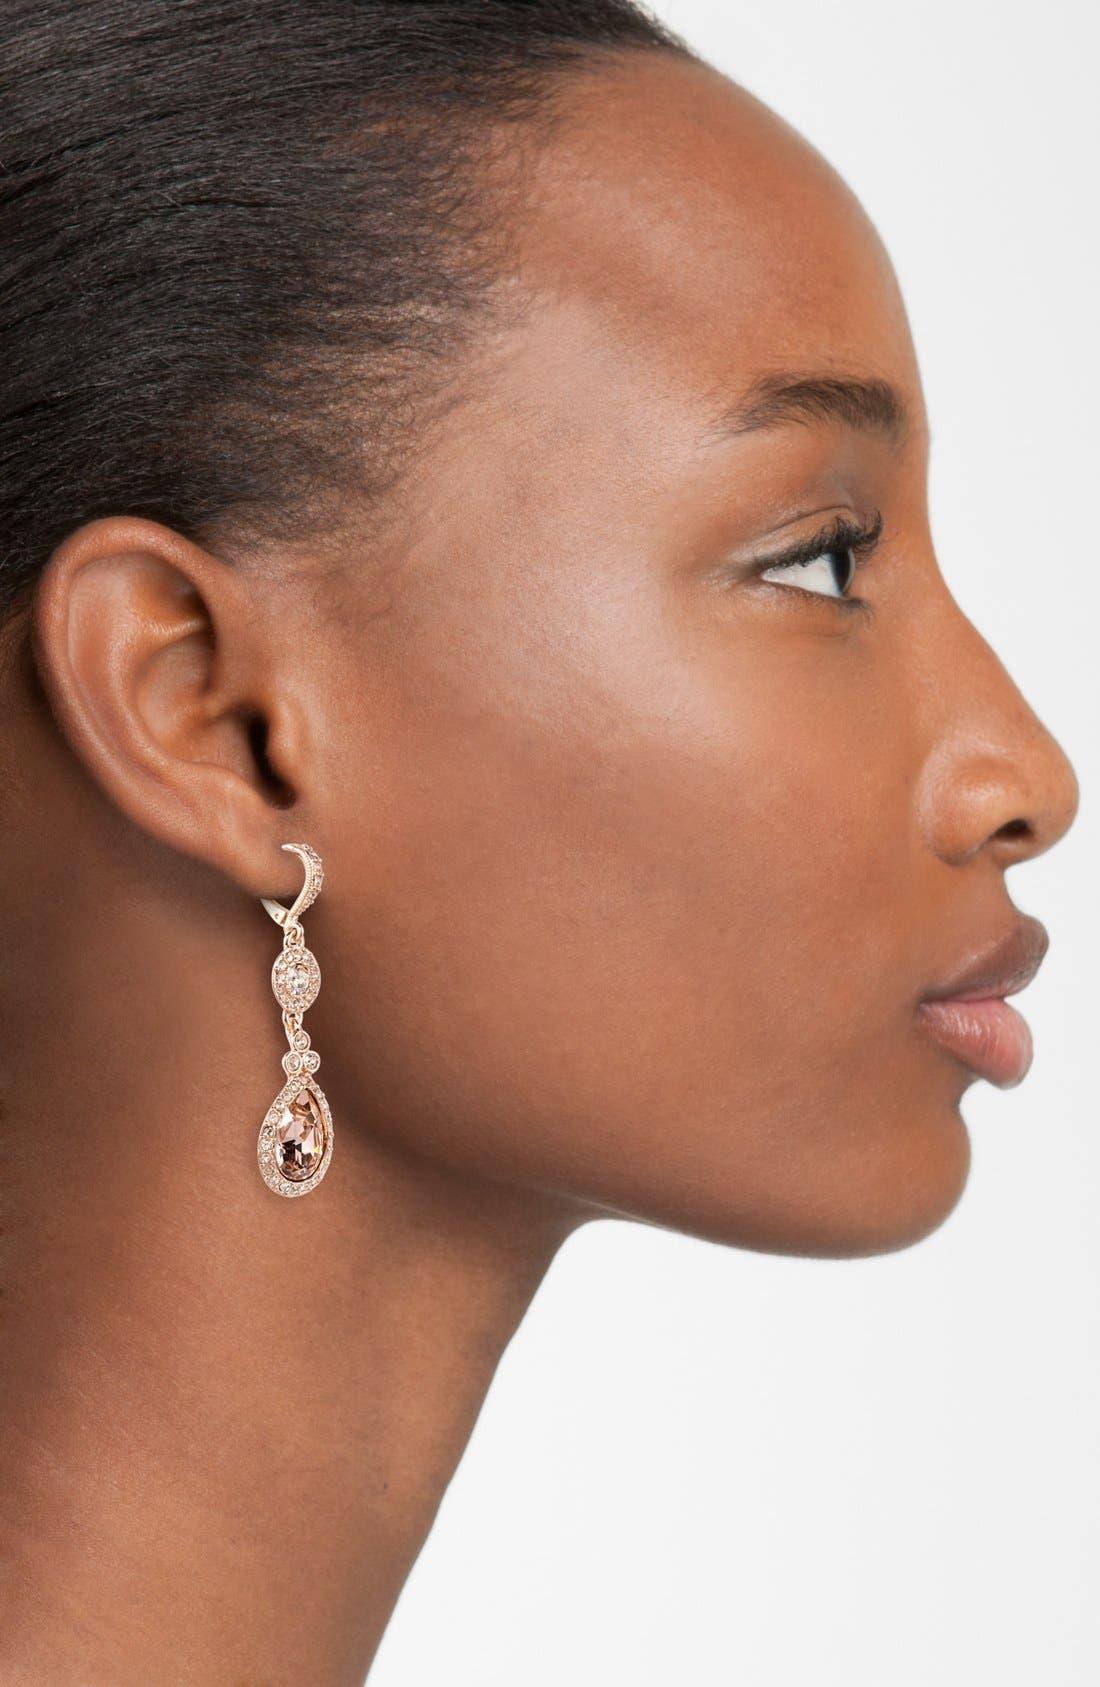 Crystal Teardrop Earrings,                             Alternate thumbnail 3, color,                             600